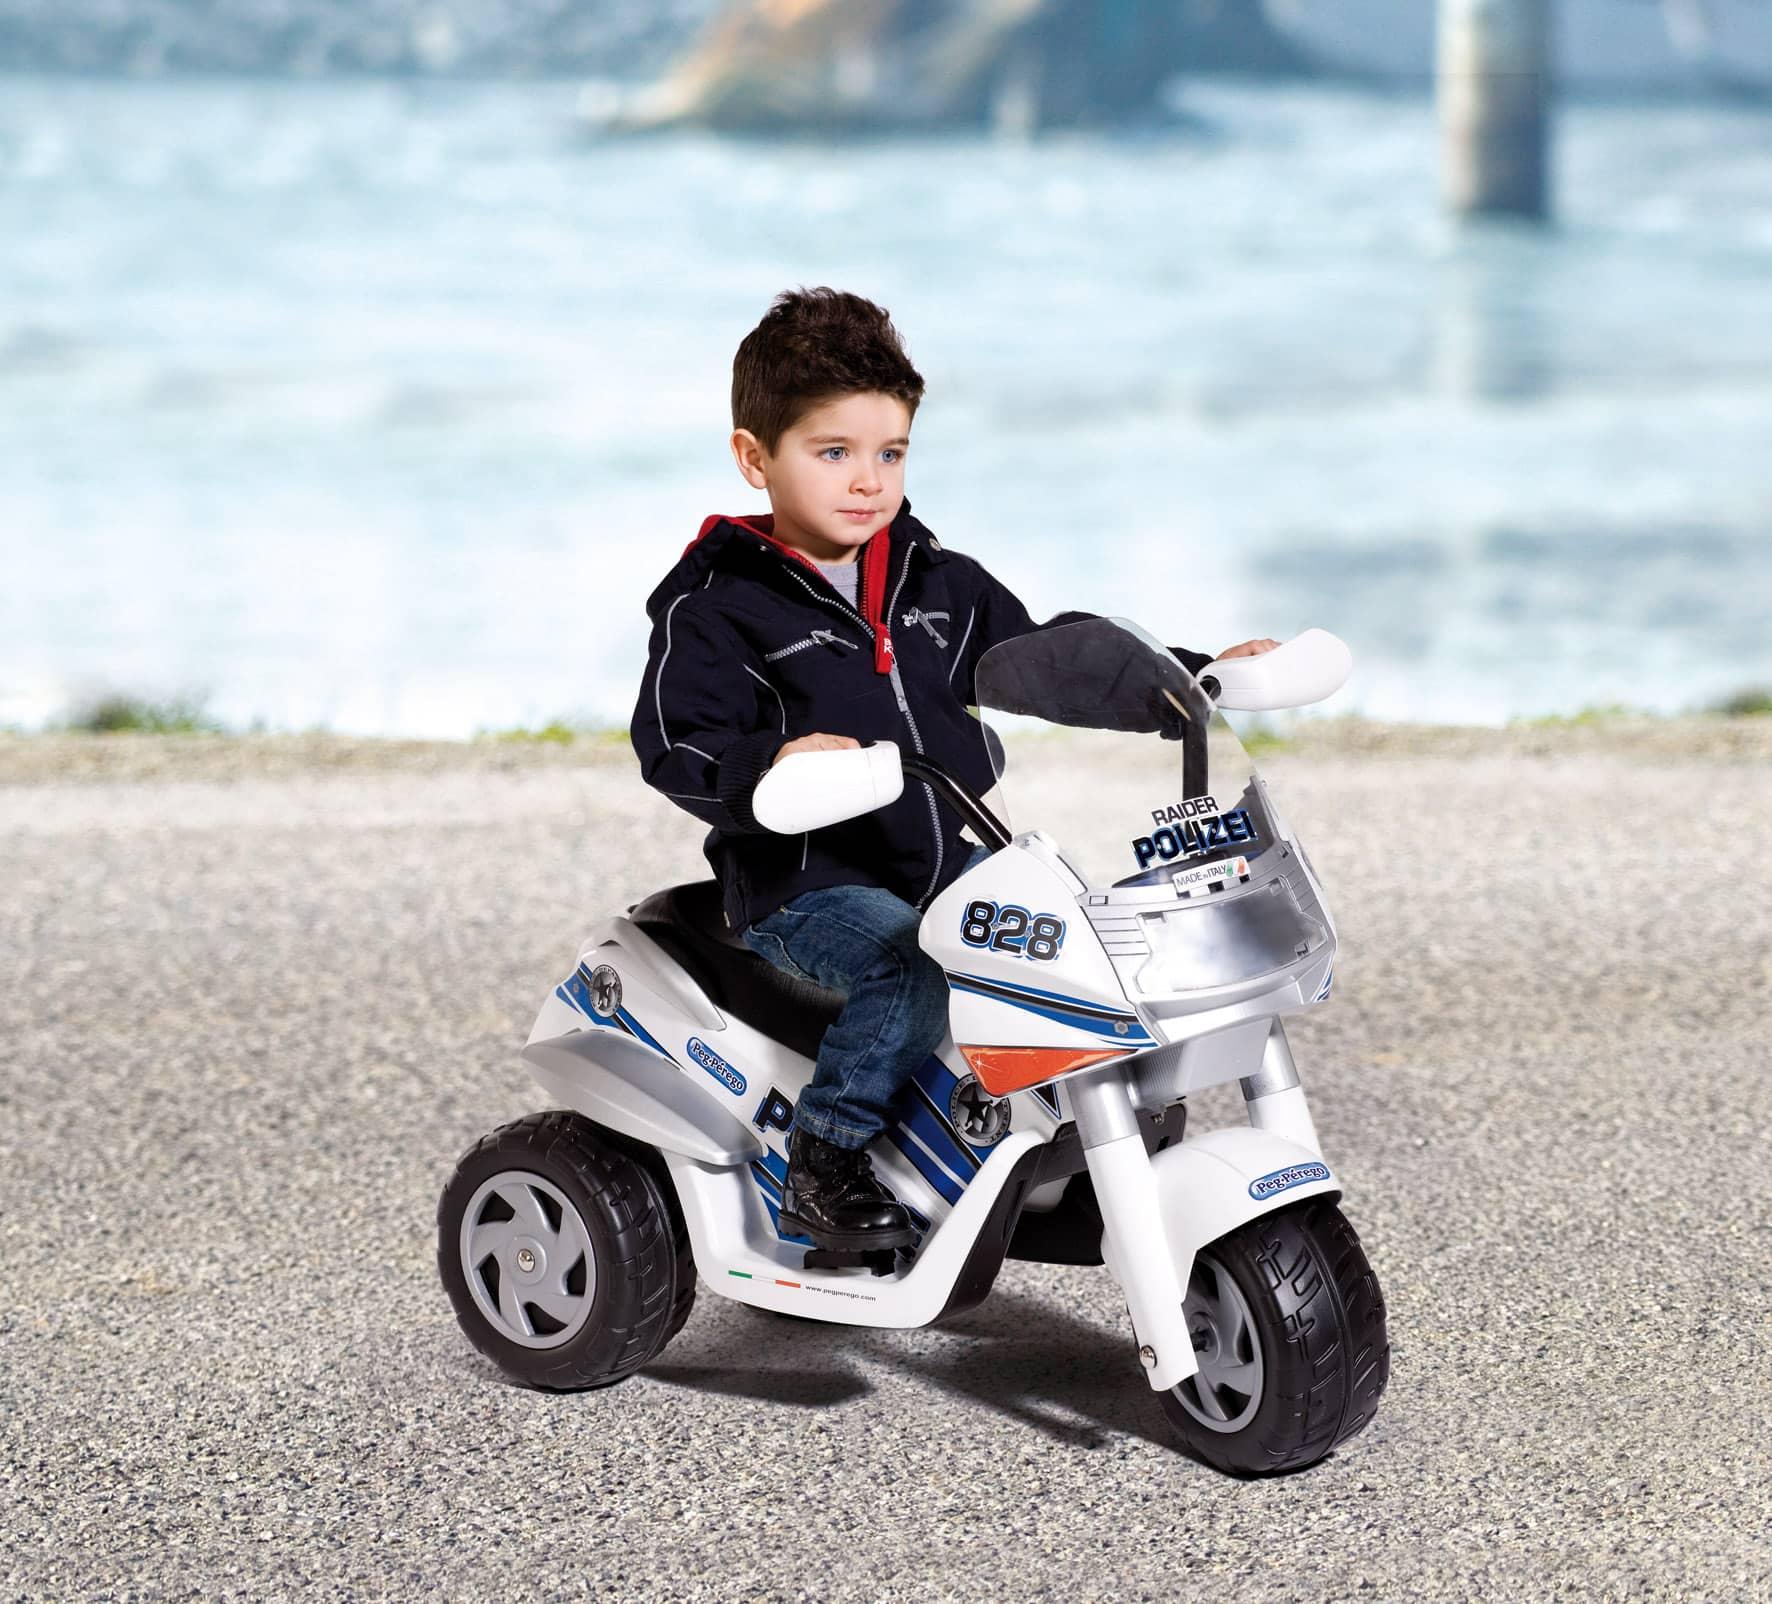 elektro motorrad 6v raider polizei kaufen. Black Bedroom Furniture Sets. Home Design Ideas